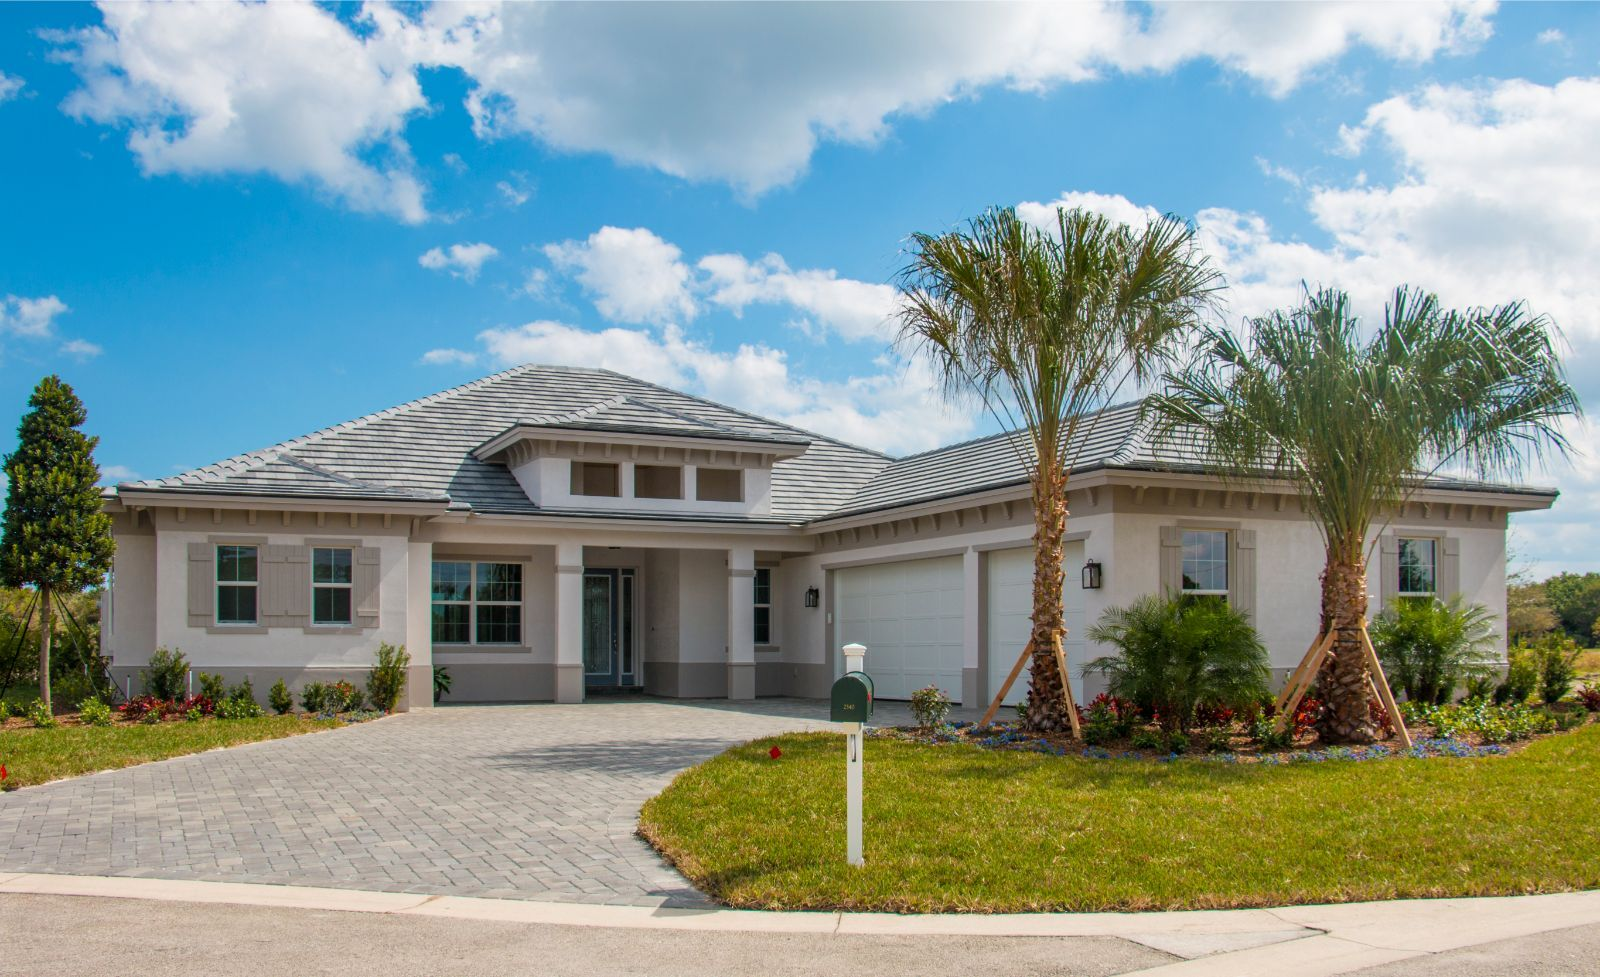 Pine Valley in Vero Beach, FL :: New Homes by Vb Custom Homes